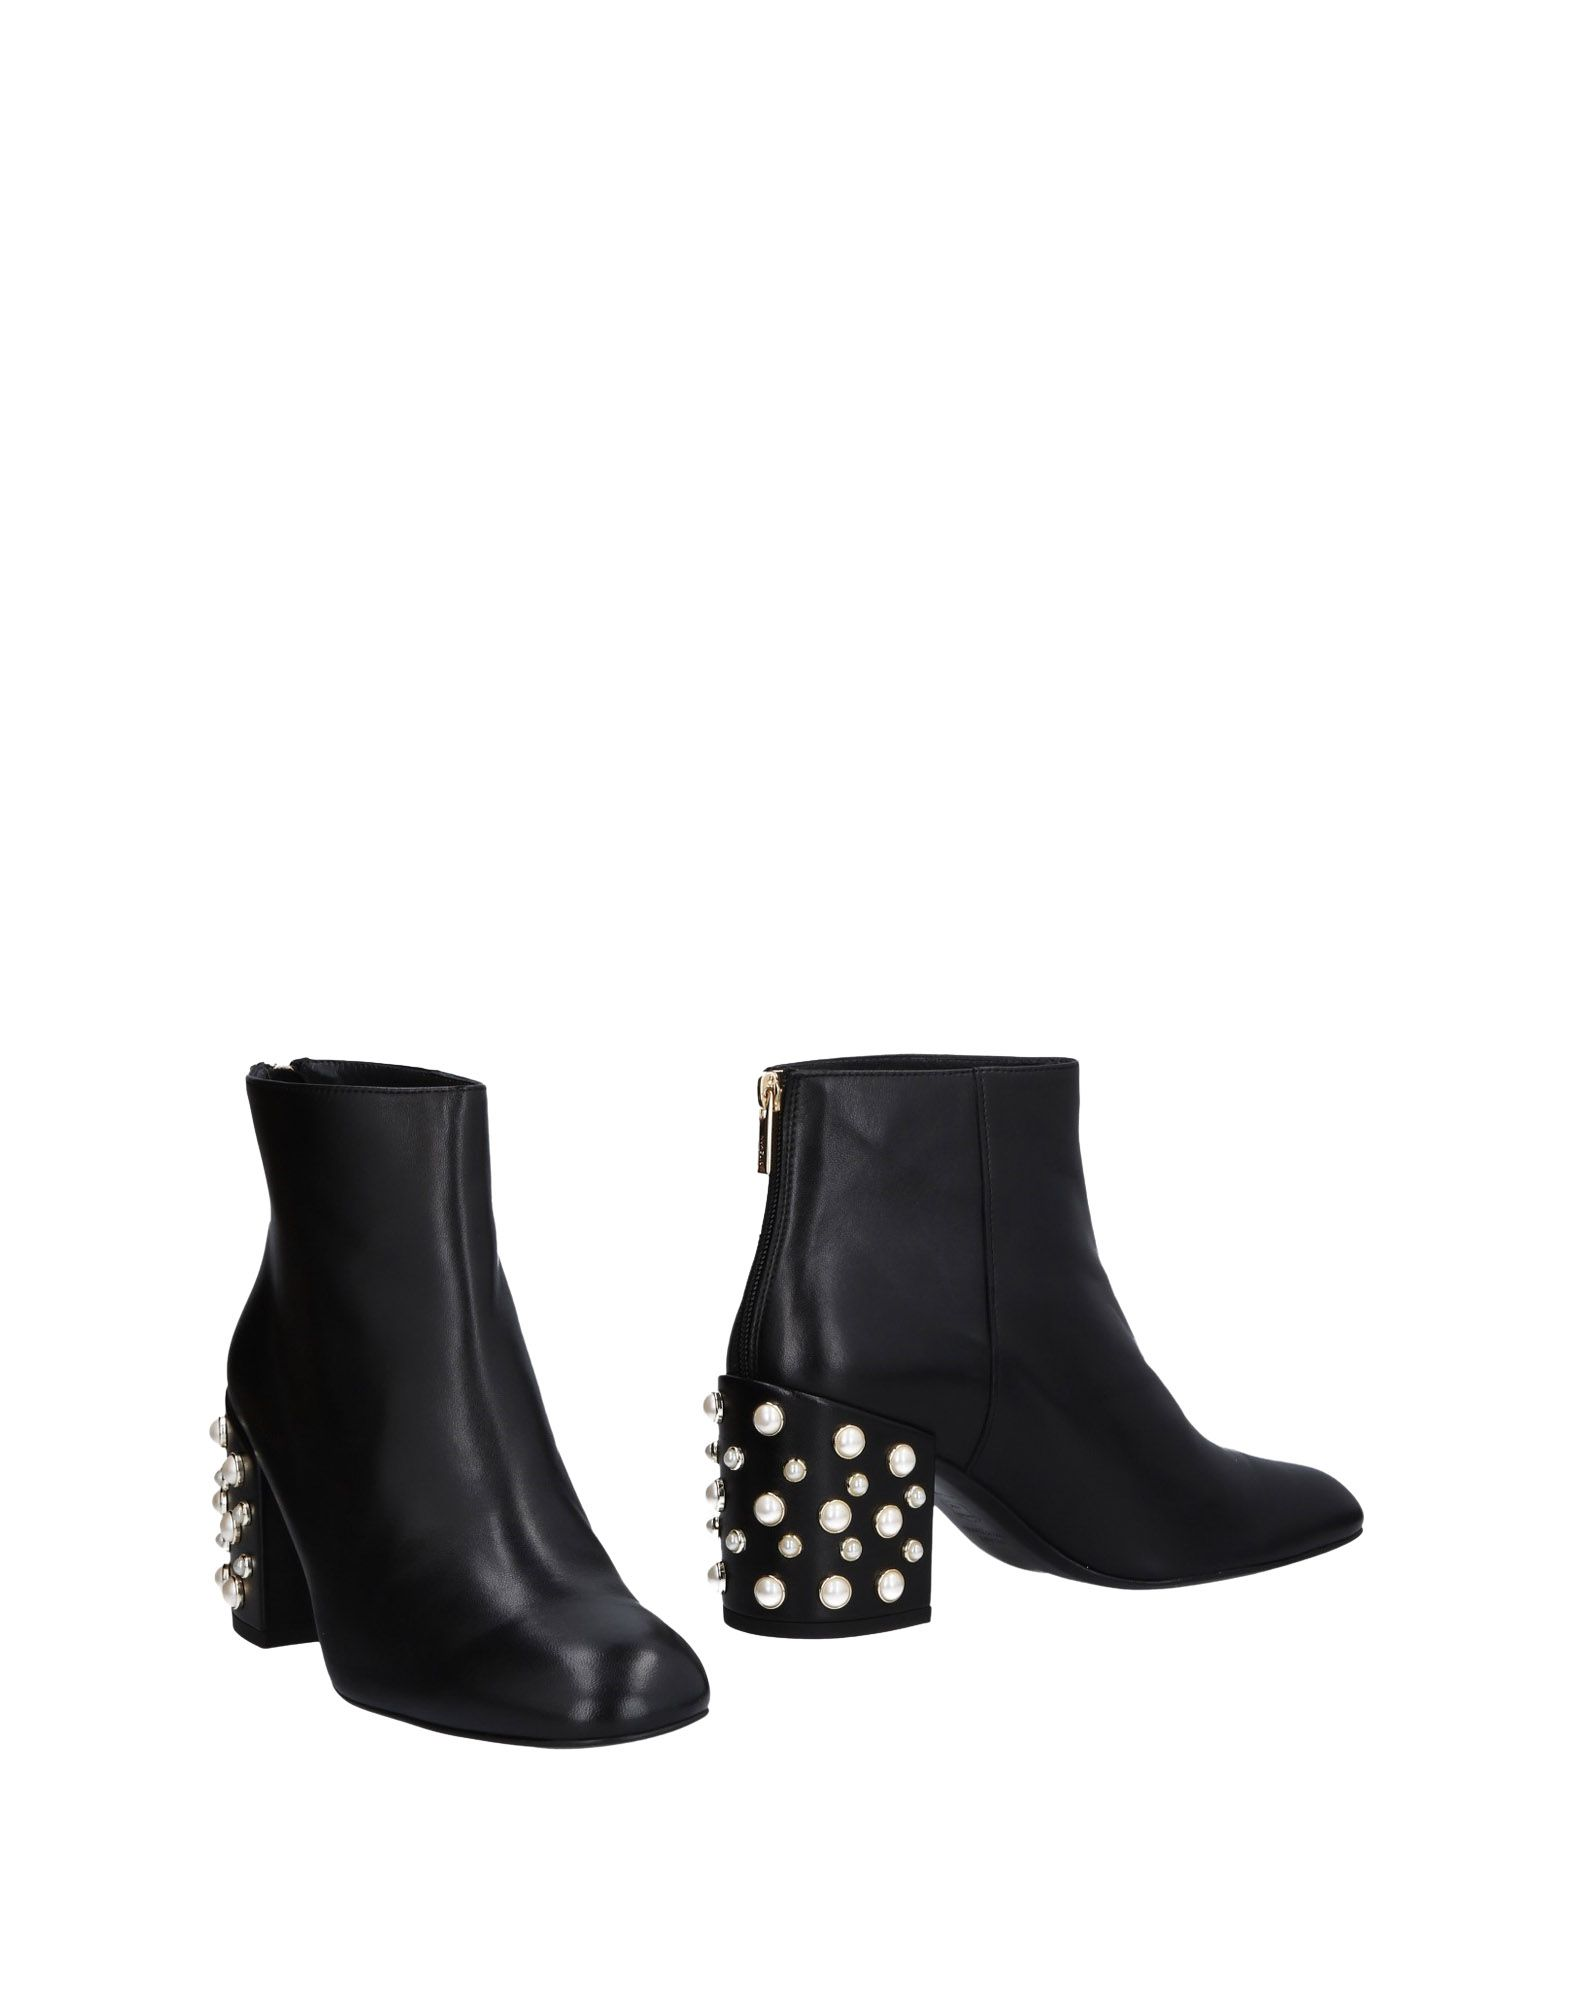 Stuart Weitzman Ankle Boot - Women Stuart Weitzman Ankle Boots - online on  Canada - Boots 11462326ST 1bd4c5